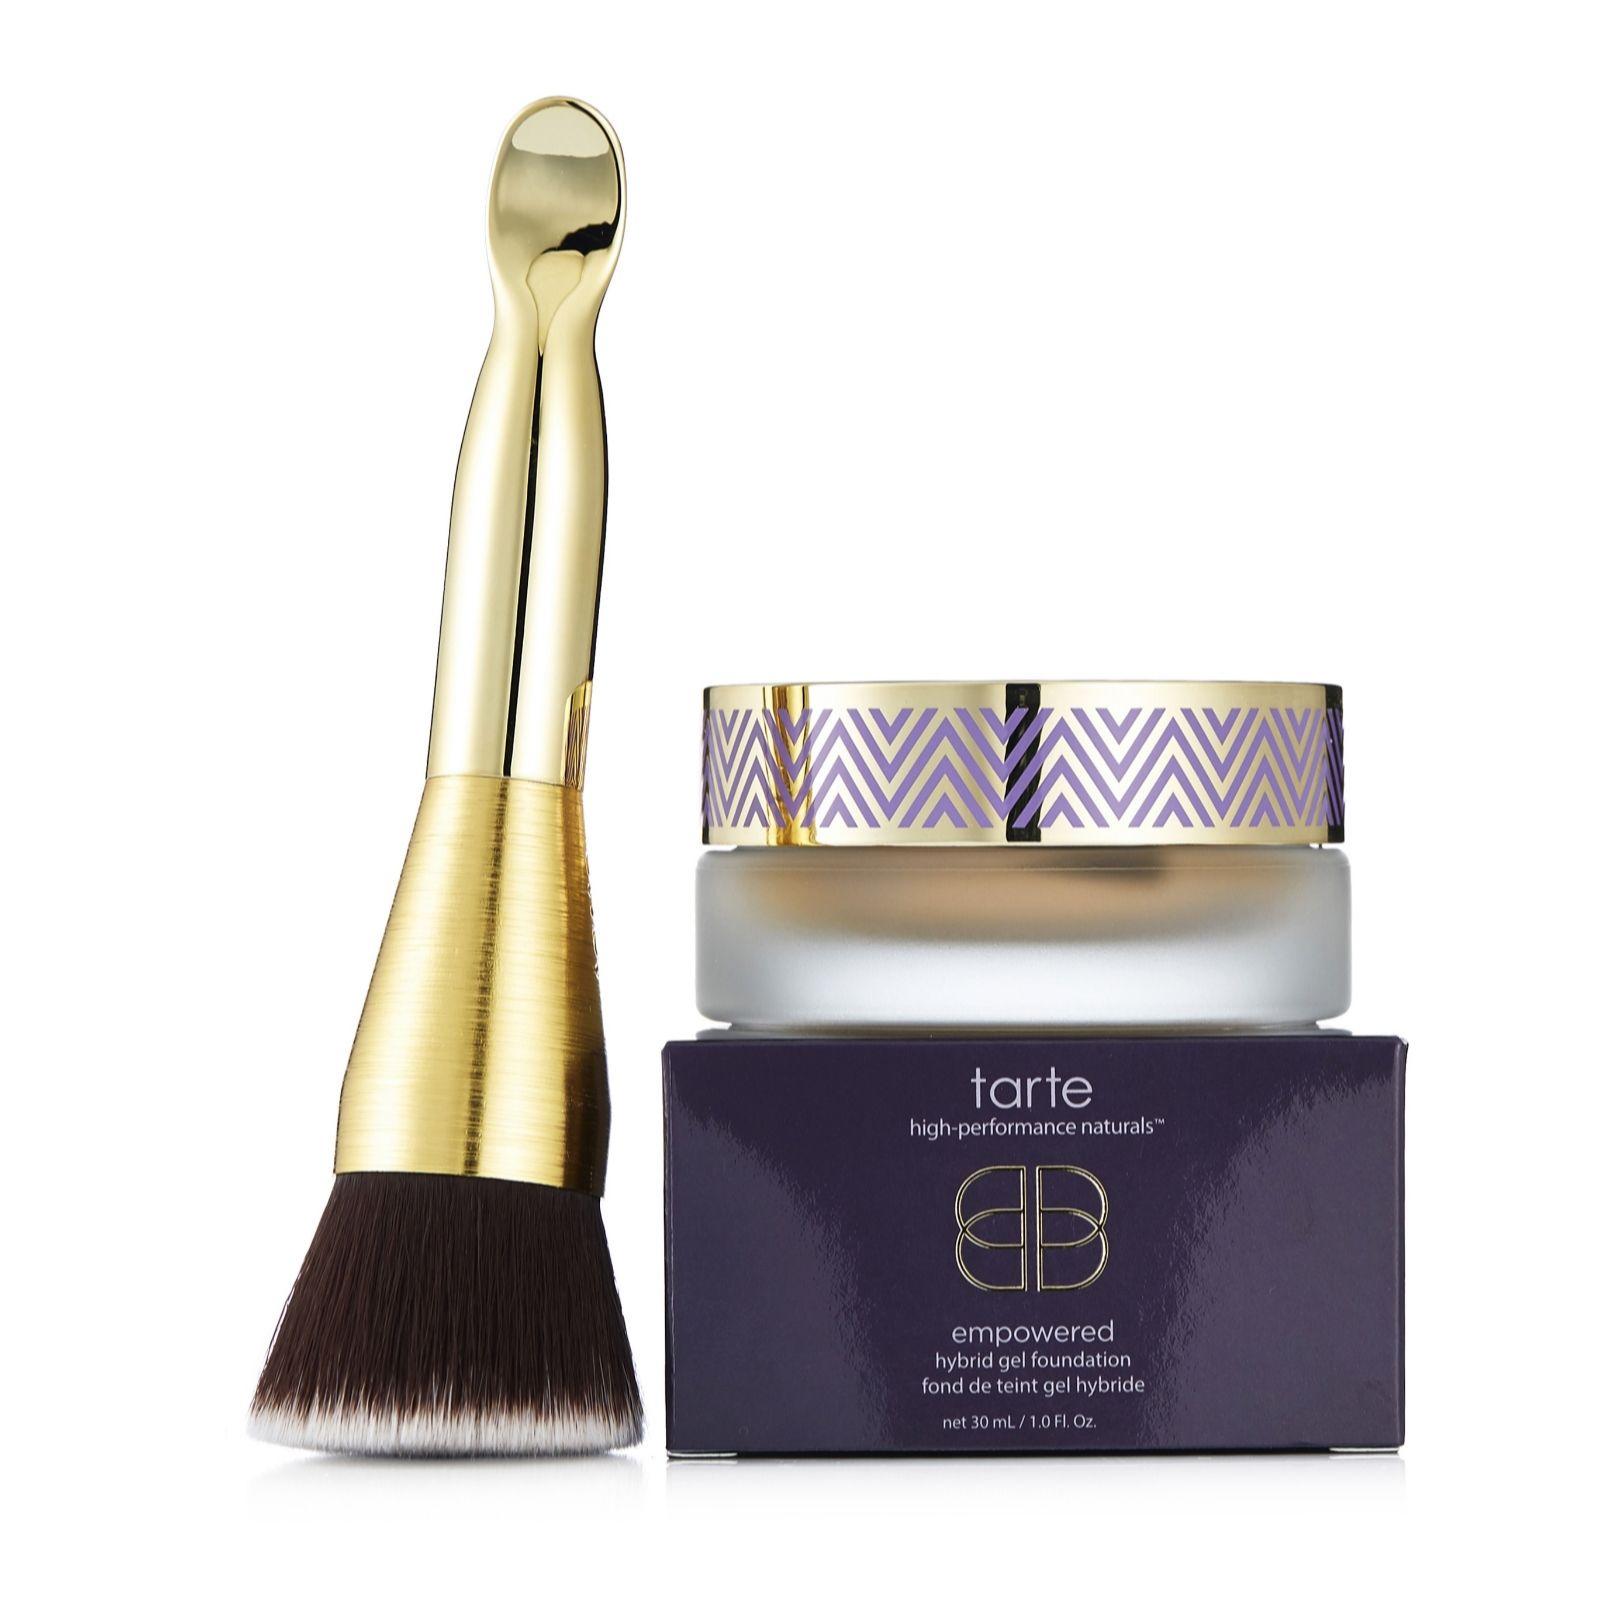 It Cosmetics x ULTA Airbrush Smoothing Foundation Brush #102 by IT Cosmetics #8